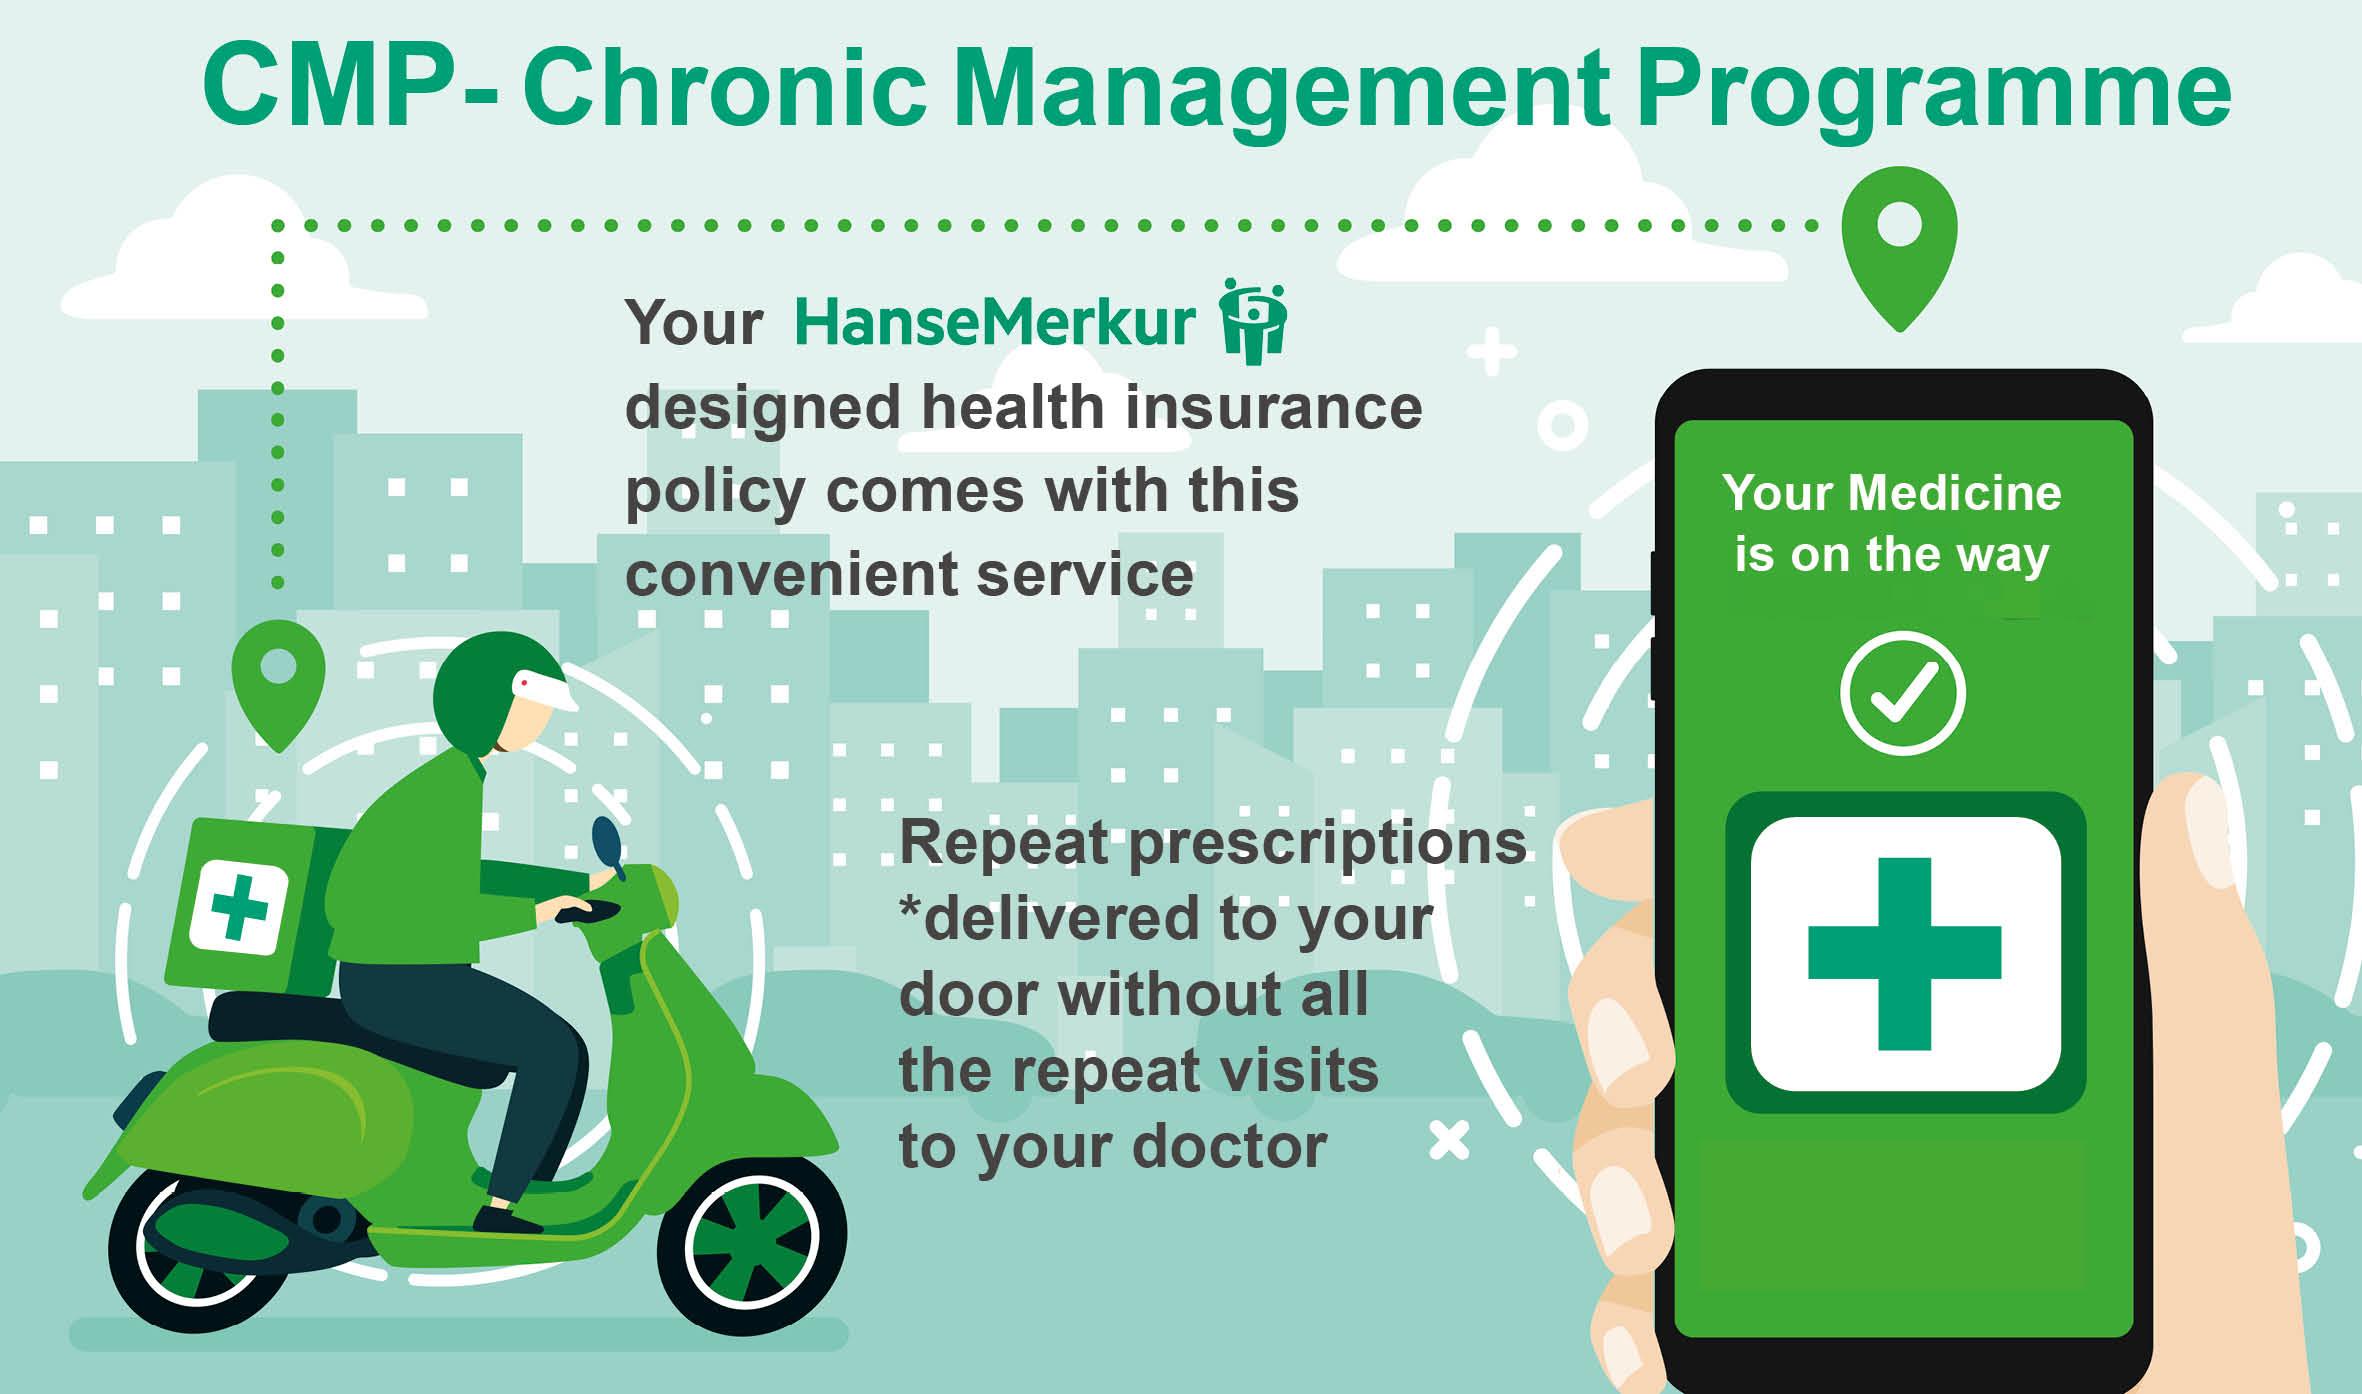 CMP Chronic Management Programme